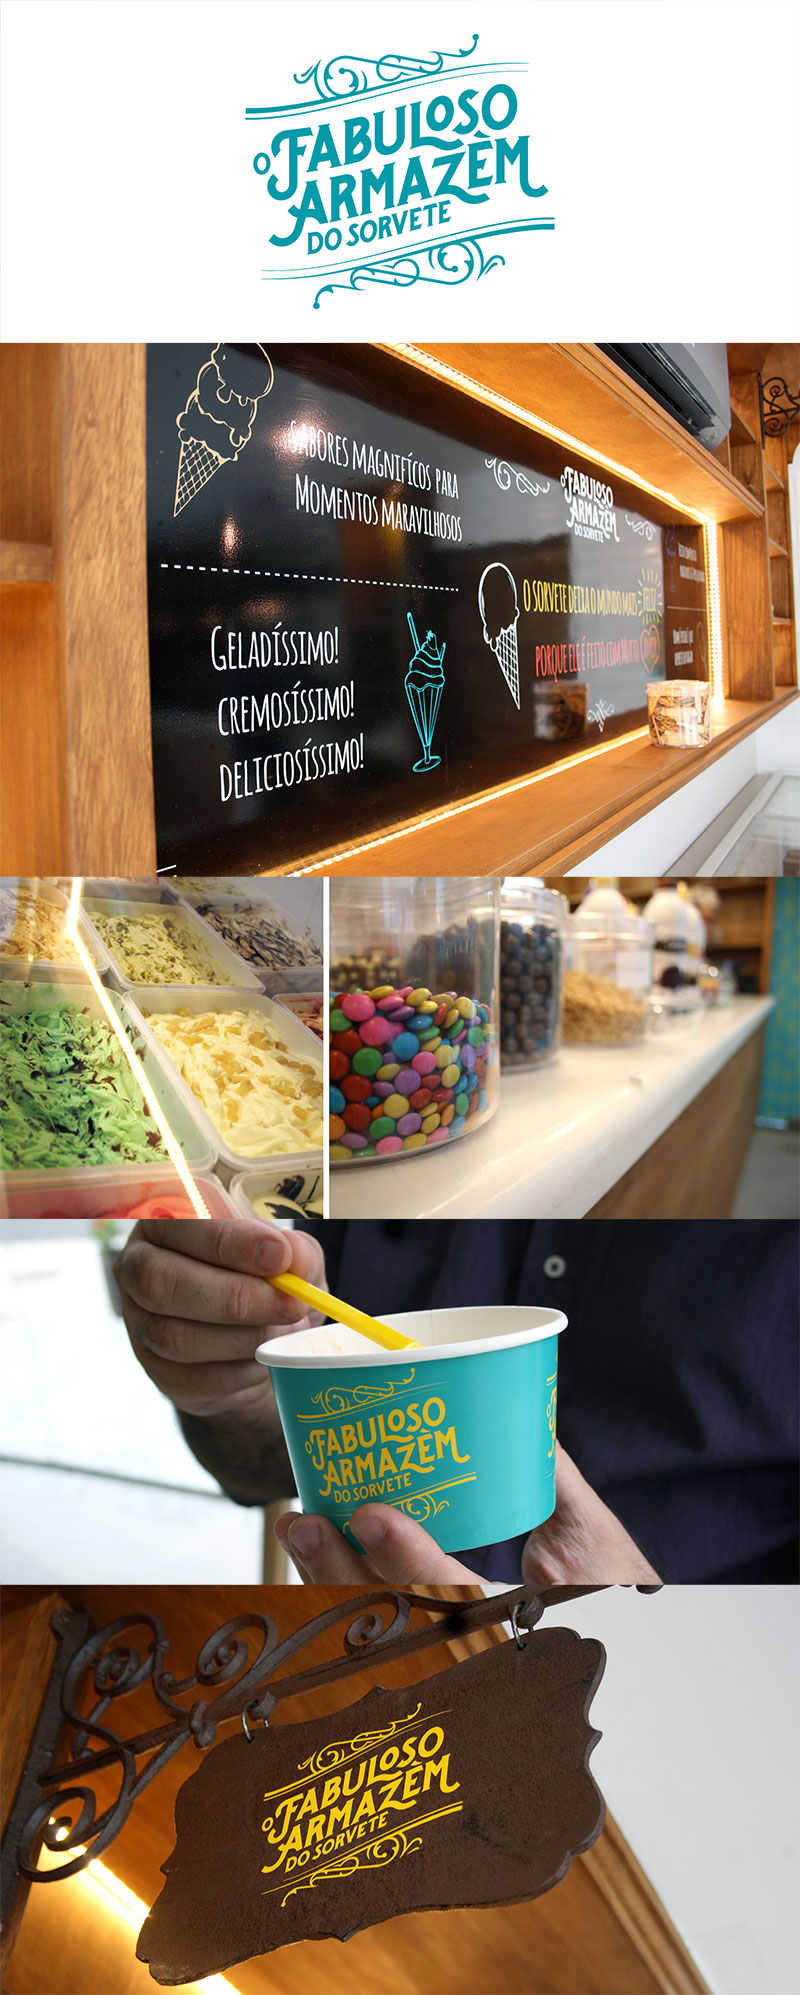 Envasado de helado - O Fabuloso Armazém do Sorvete